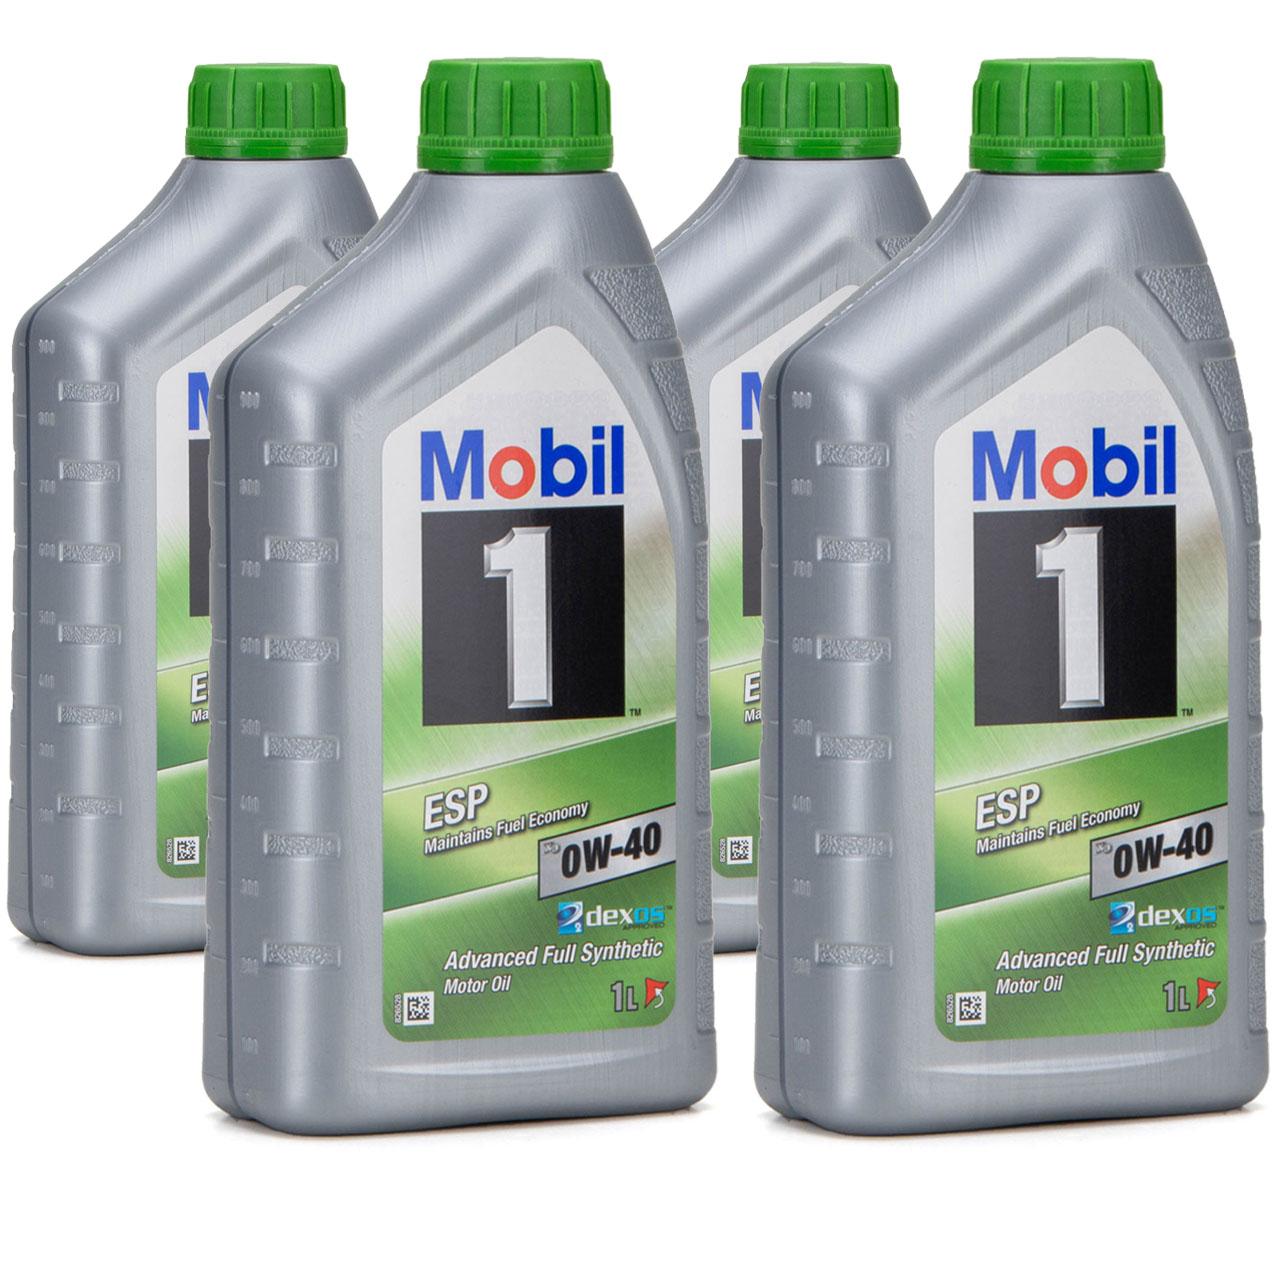 Mobil 1 ESP X3 C40 Motoröl Öl 0W-40 0W40 dexos2 PORSCHE C40 VW 511.00 - 4 Liter